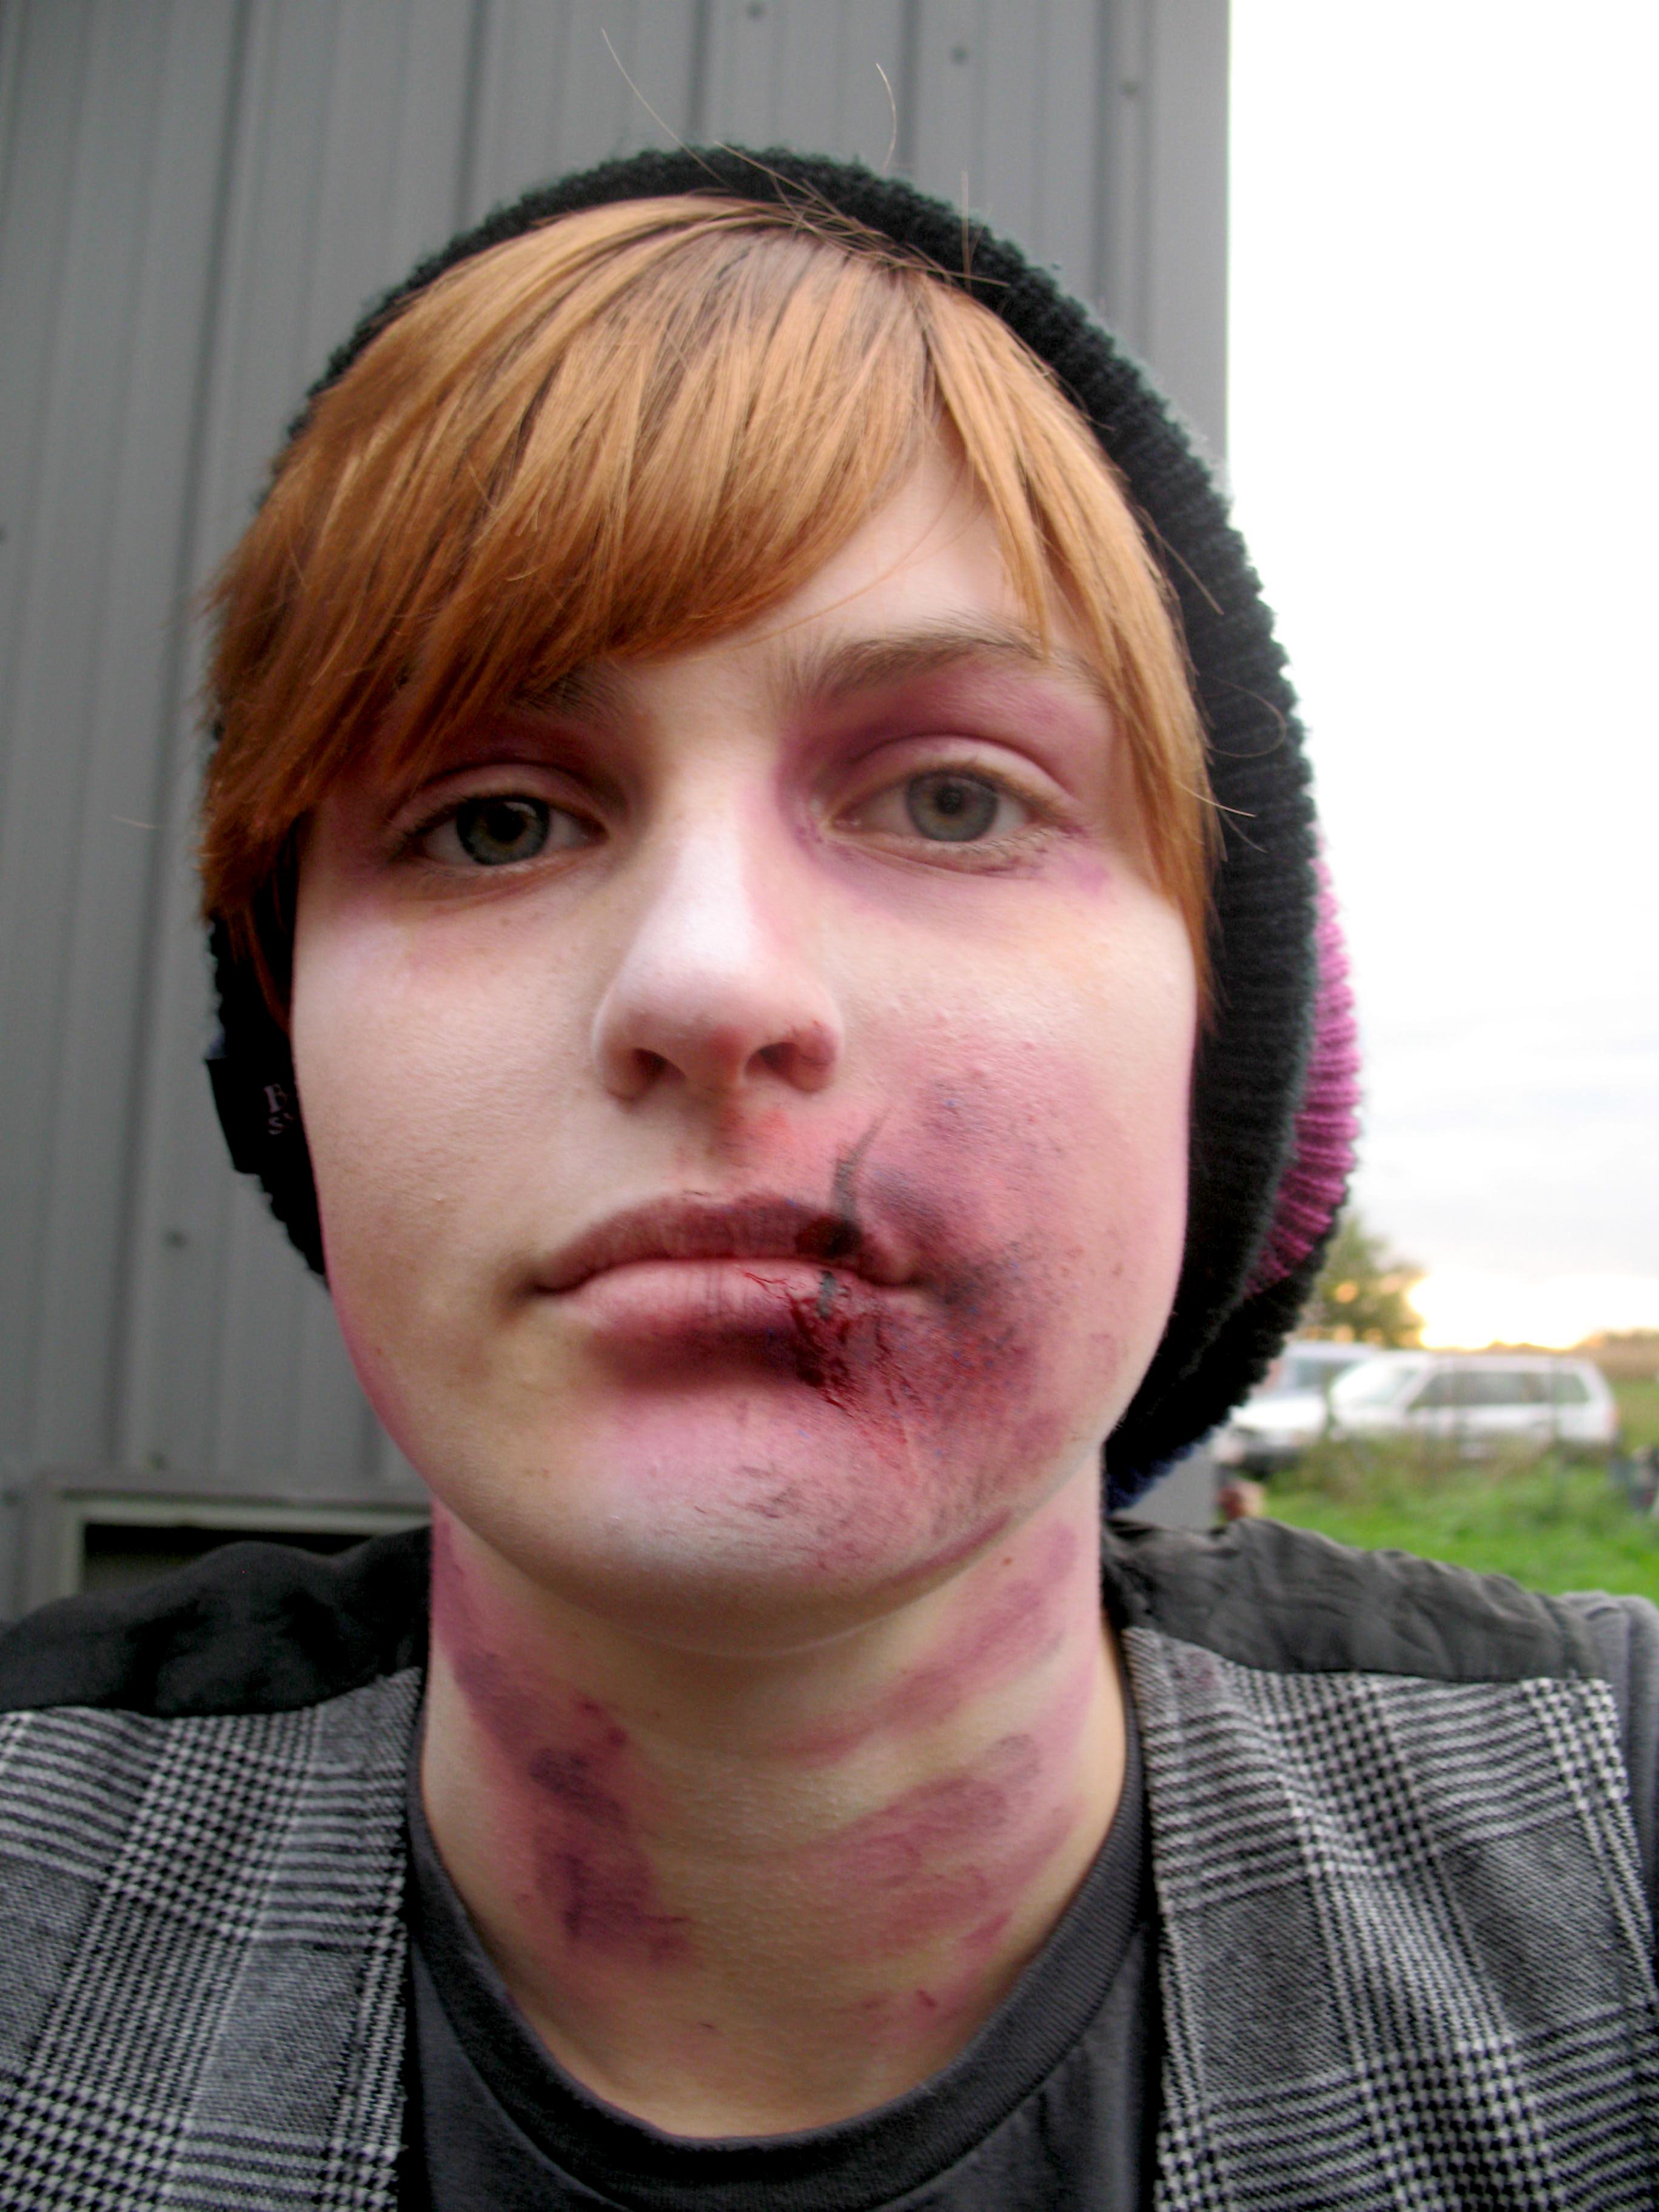 abuse make up, swollen lip